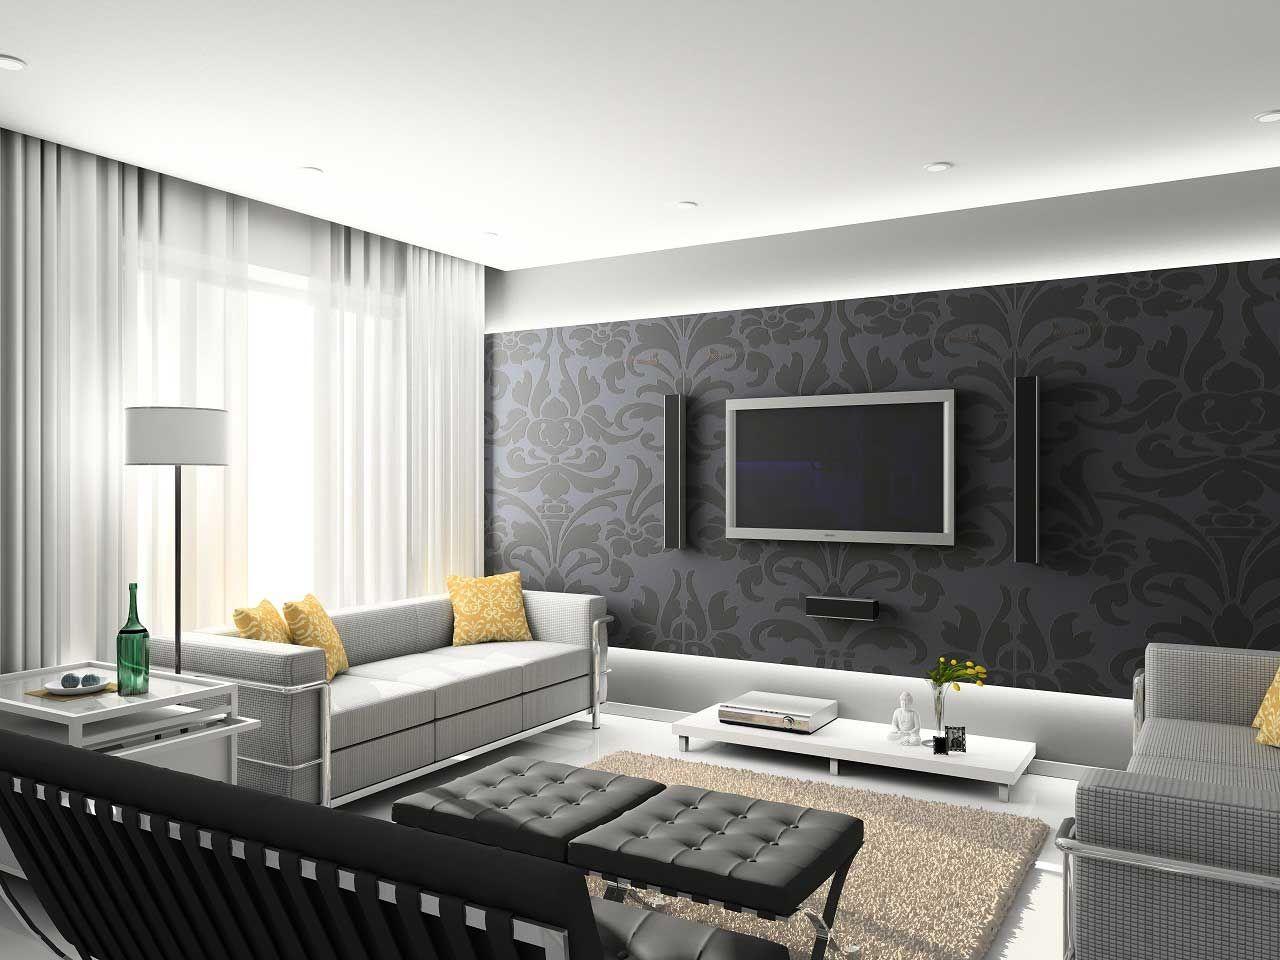 Creative Tv Set Design Living Room Trendy Apartment Homey Small Loft ...